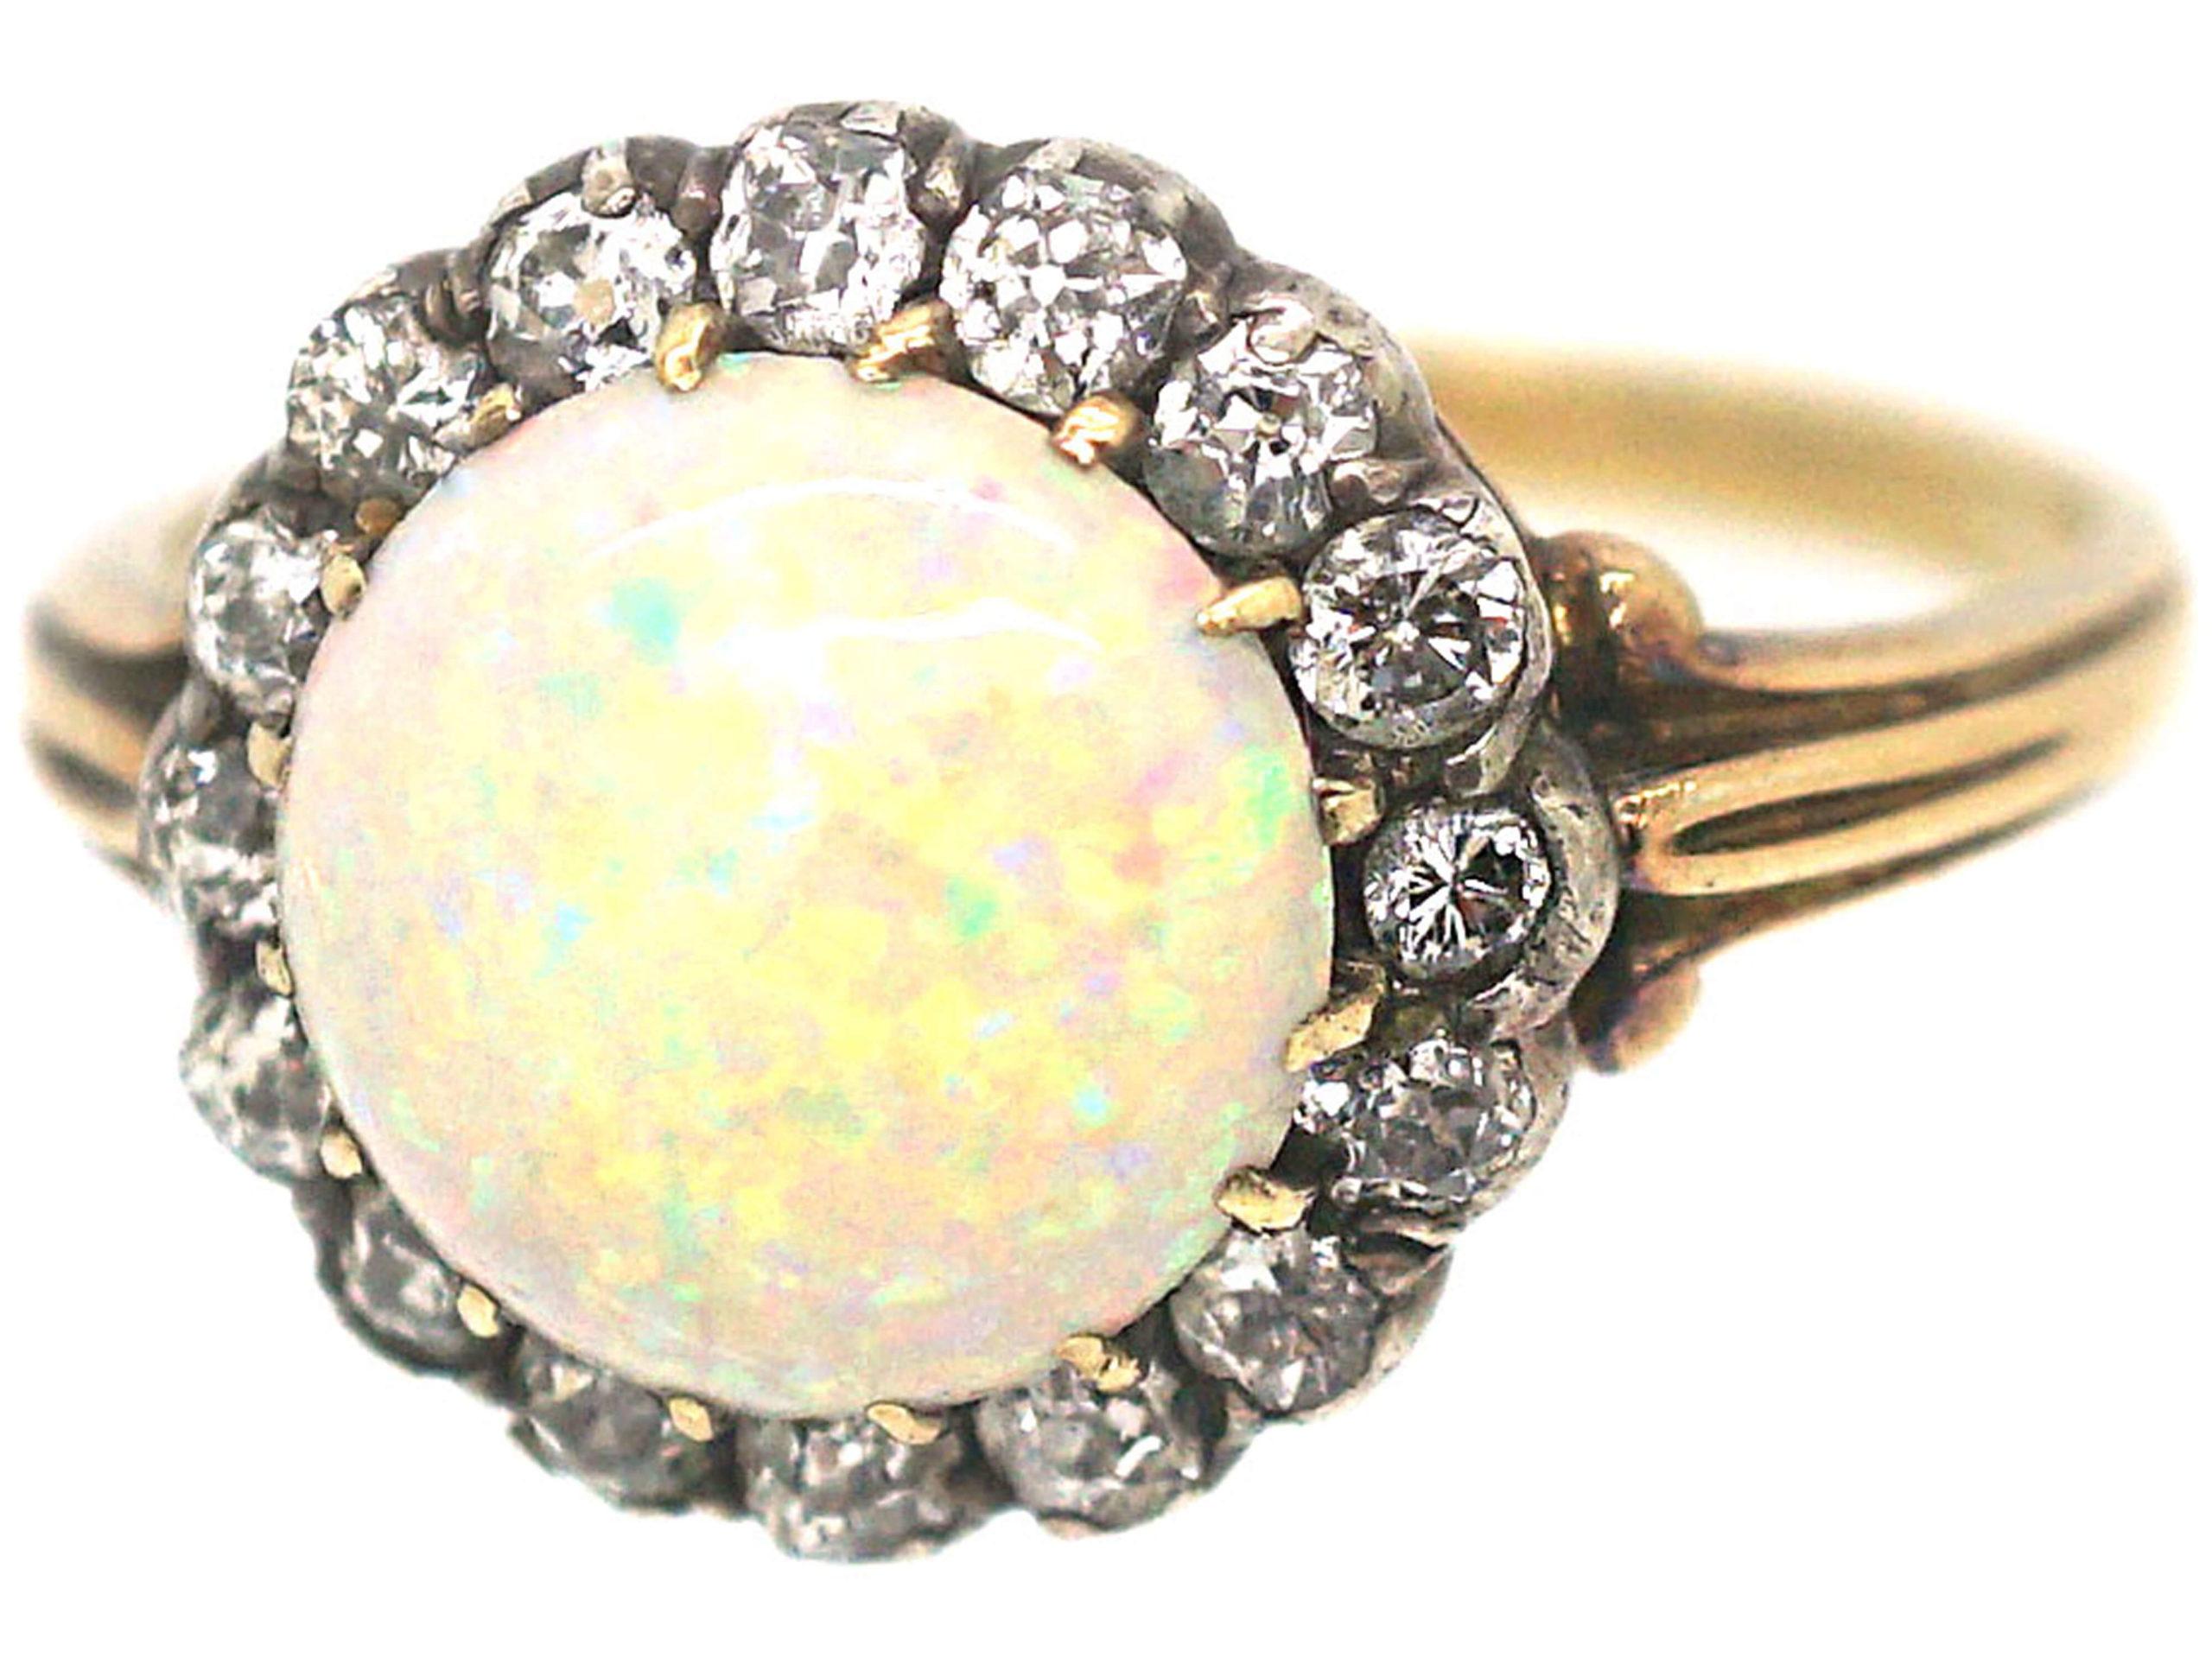 Edwardian 18ct Gold, Opal & Diamond Ring